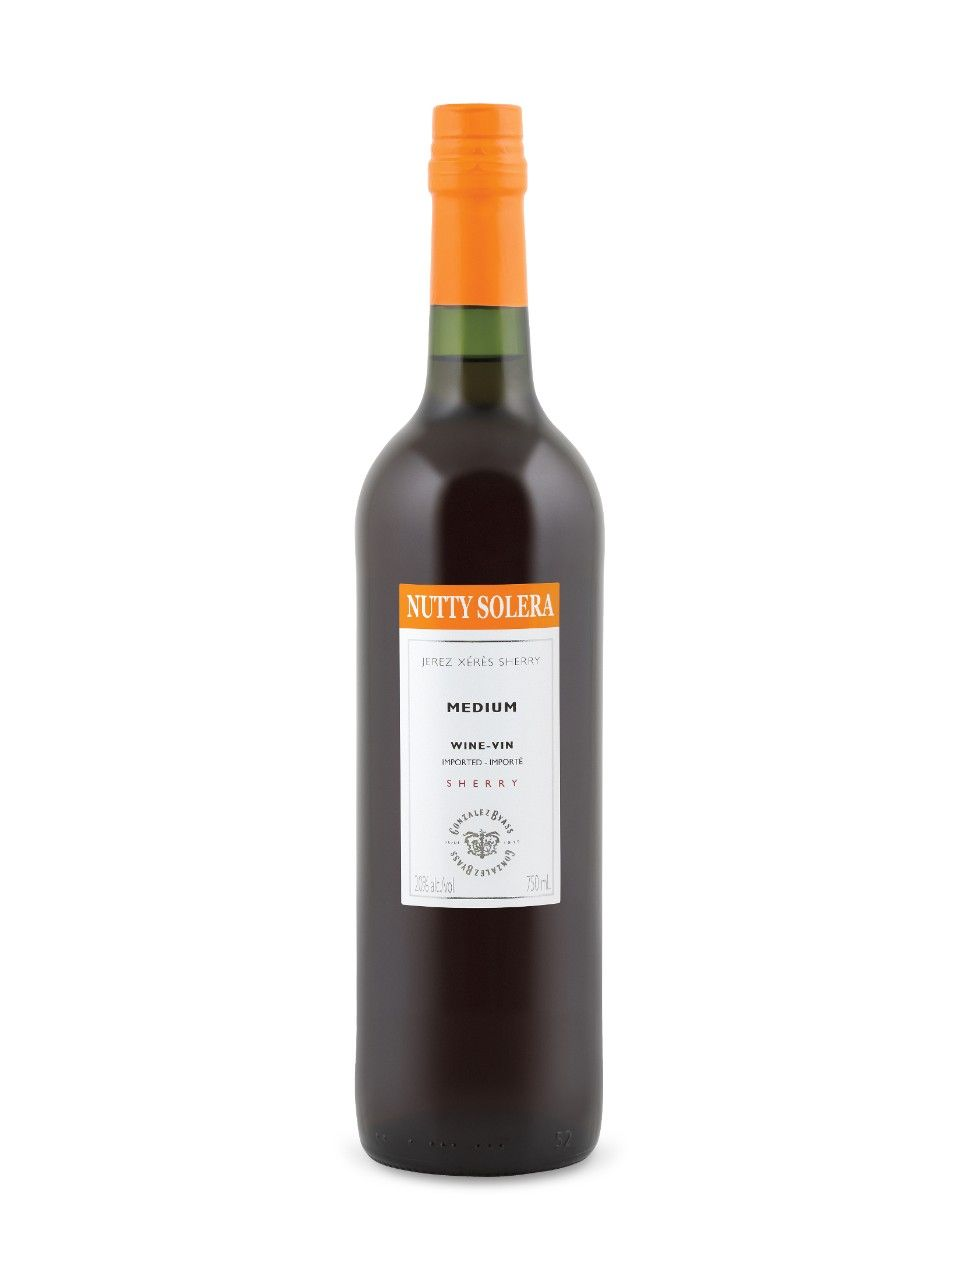 González Byass Nutty Solera Medium Oloroso Sherry